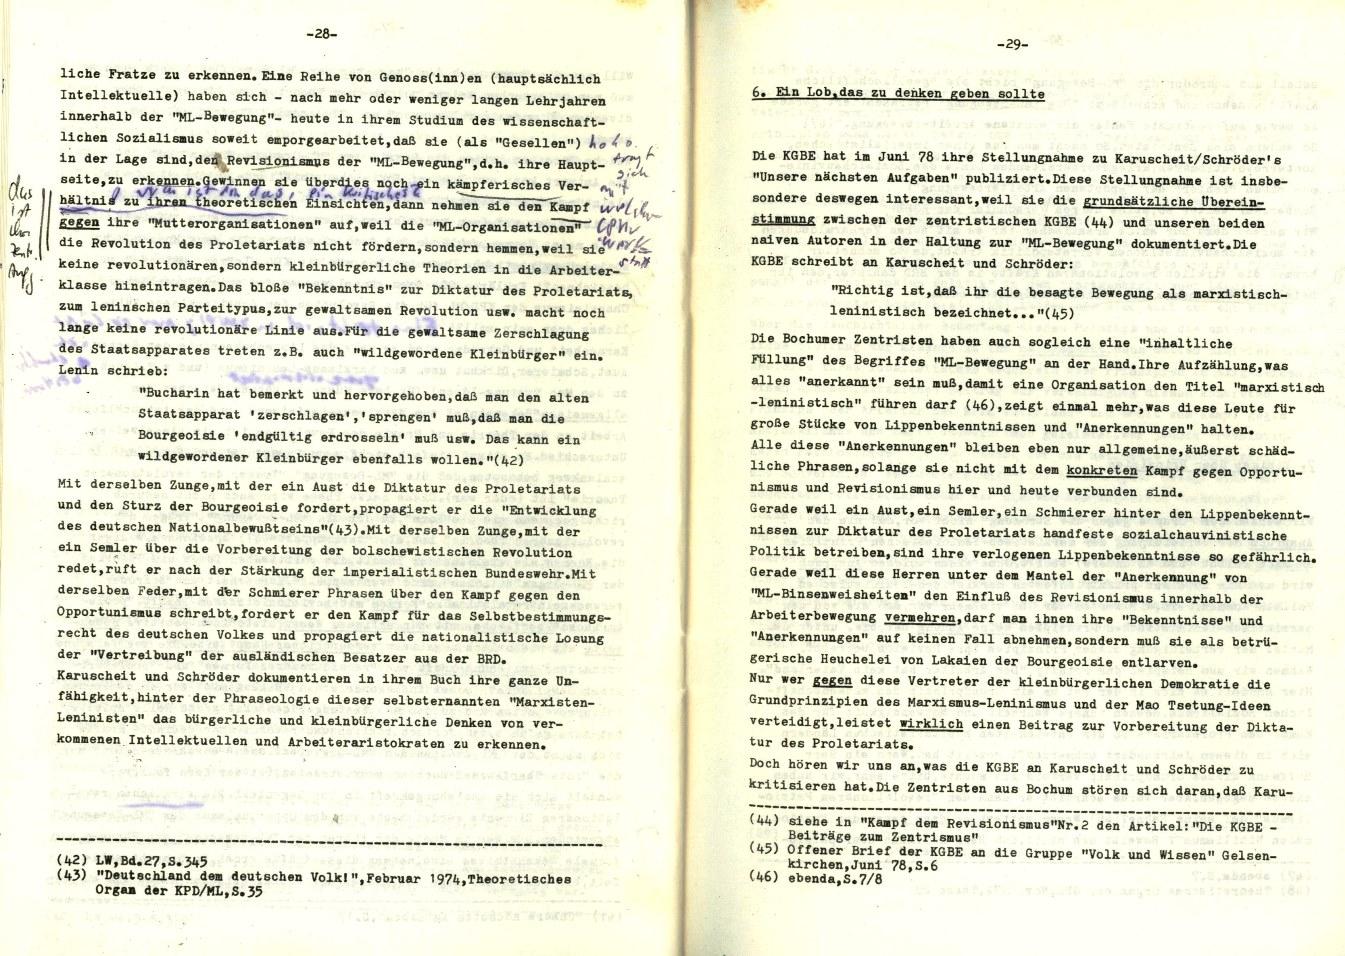 Muenchen_Kampf_dem_Revisionismus_1978_07_15